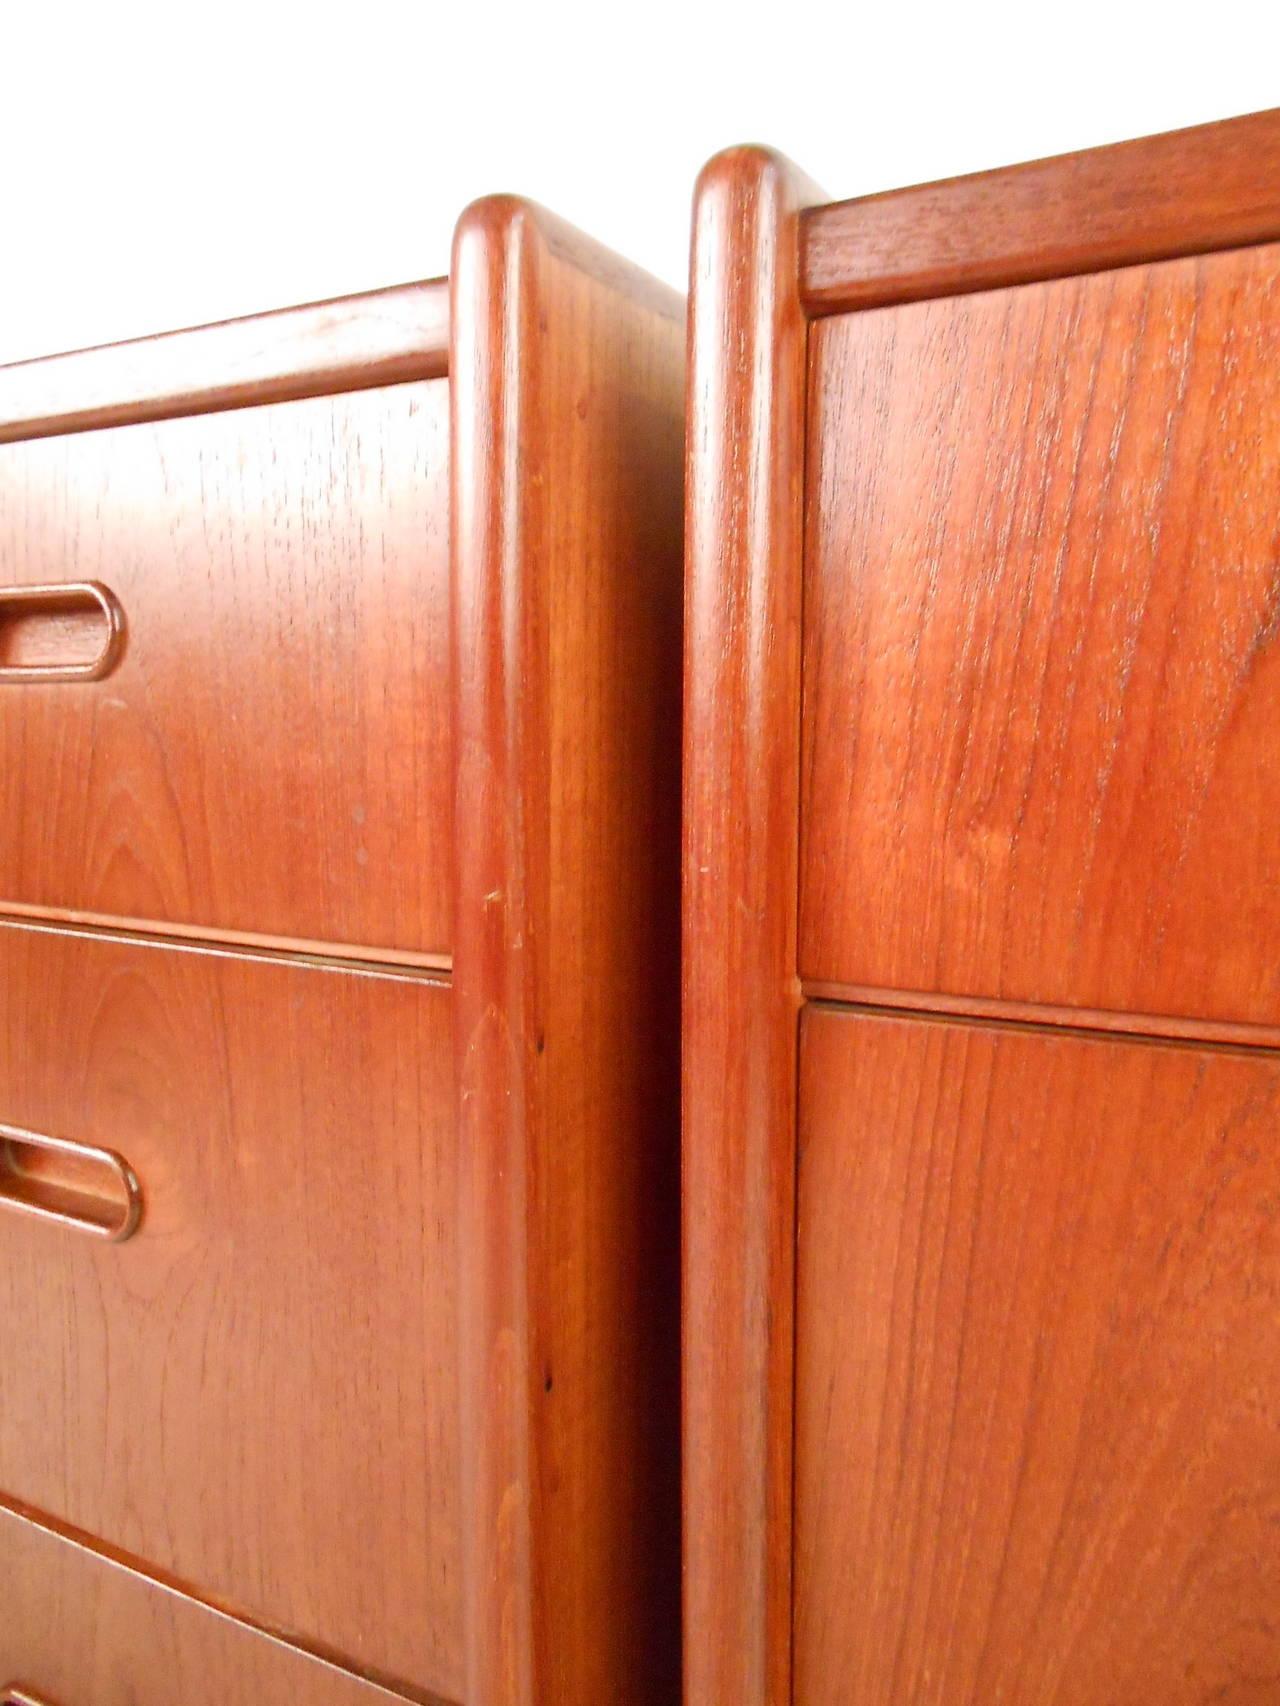 Pair of Mid-Century Modern Danish Teak Bedroom Dressers For Sale 1